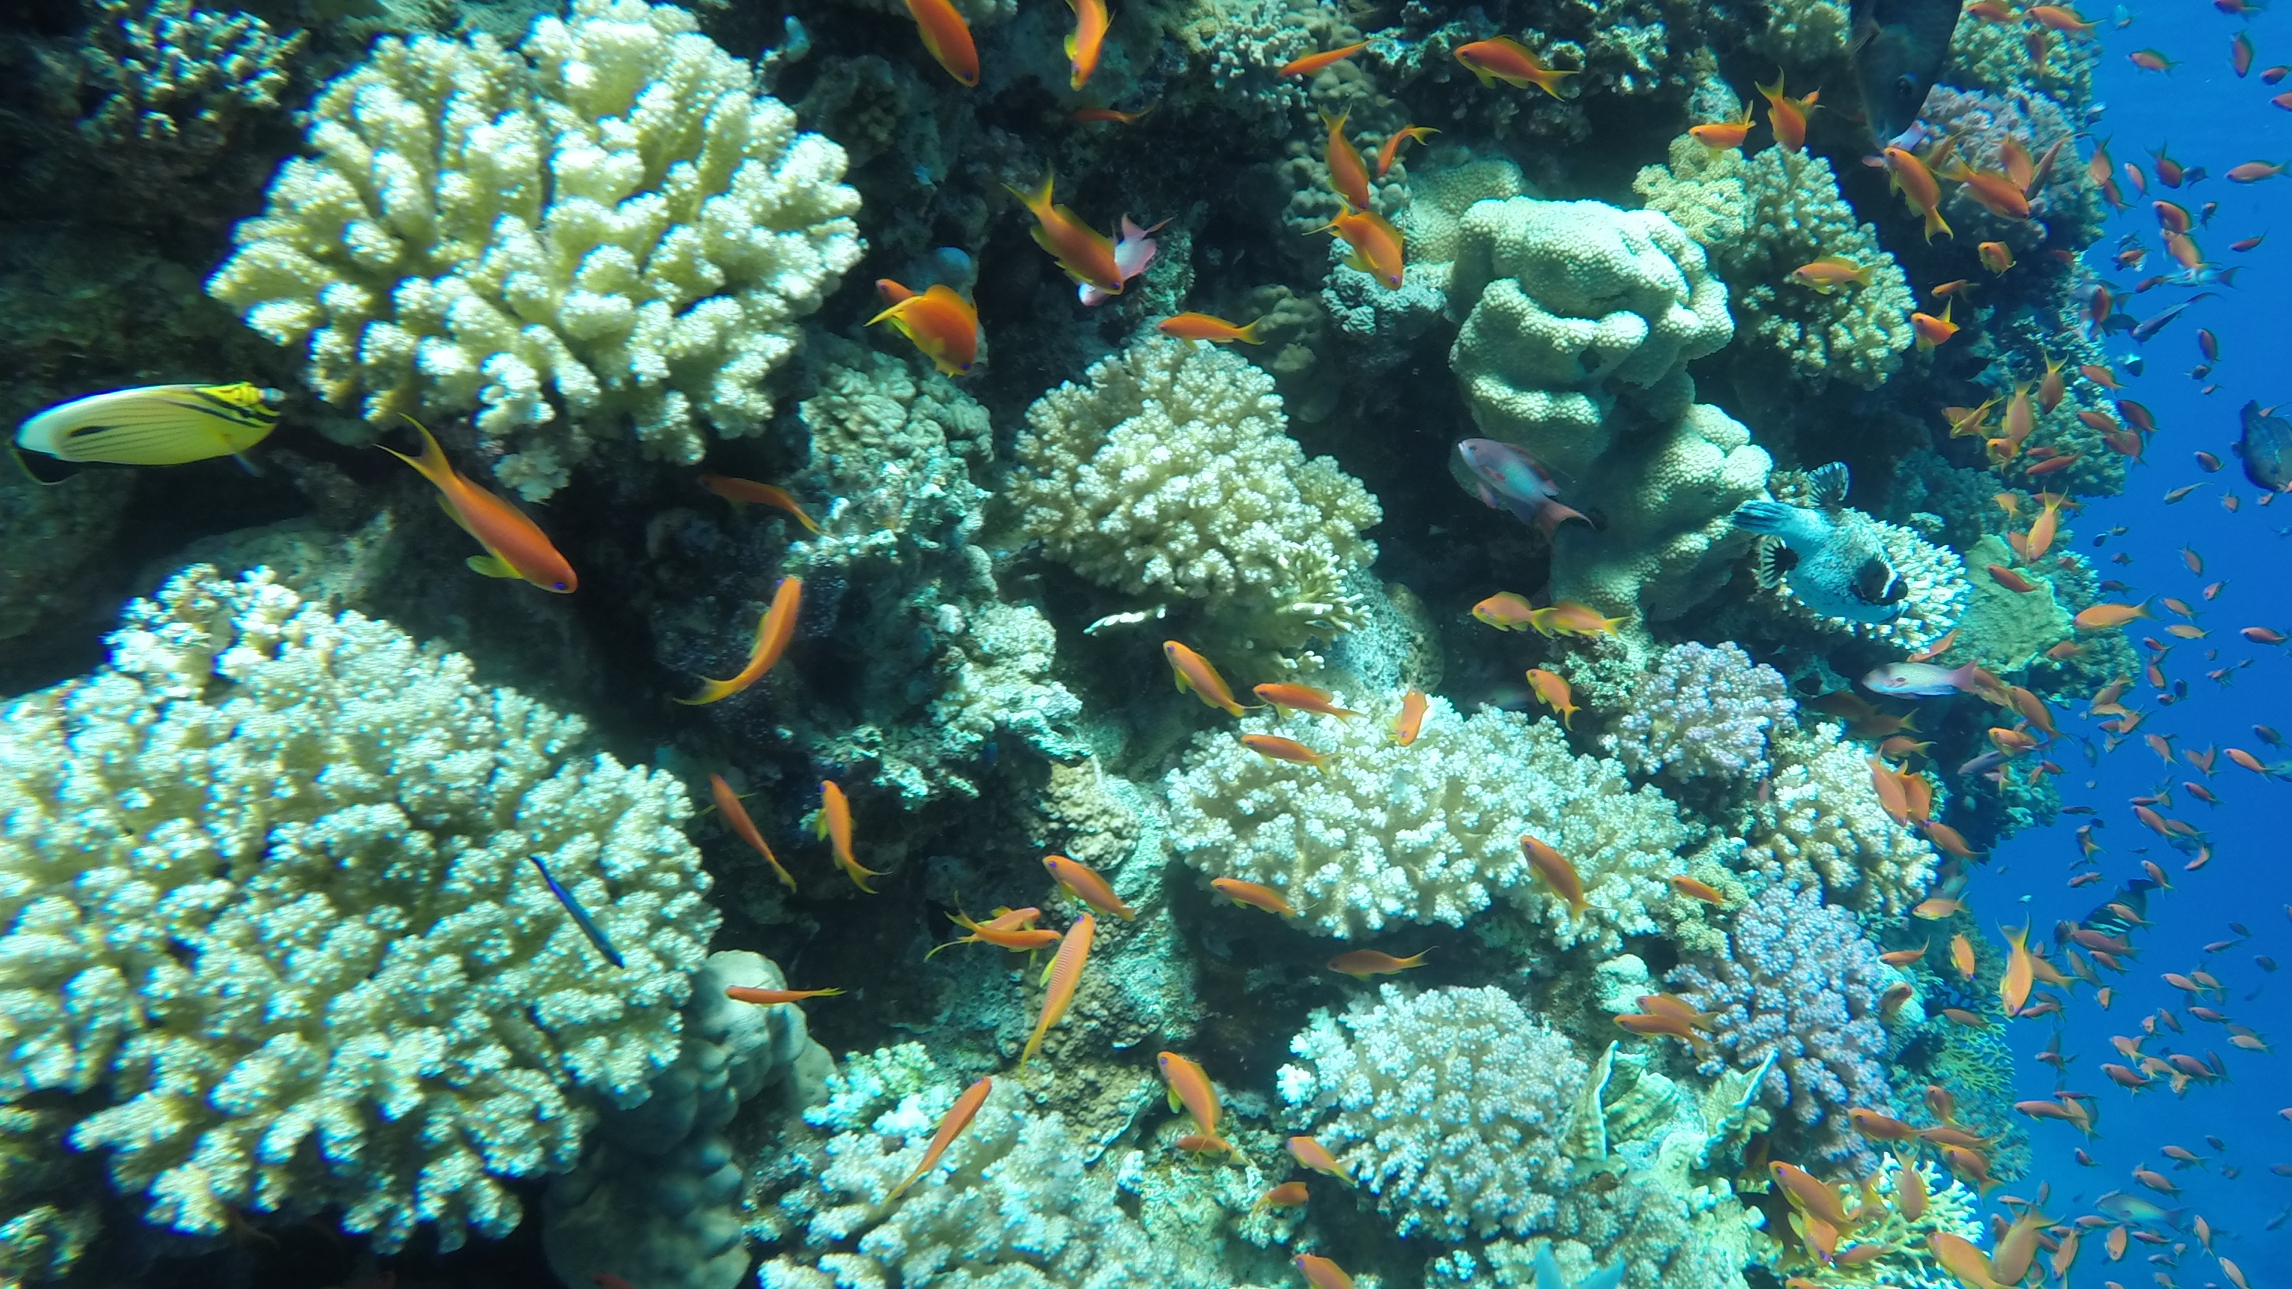 Excursion Diving Tiran from Sharm El Sheikh: photo of corals and fish near Tiran Island